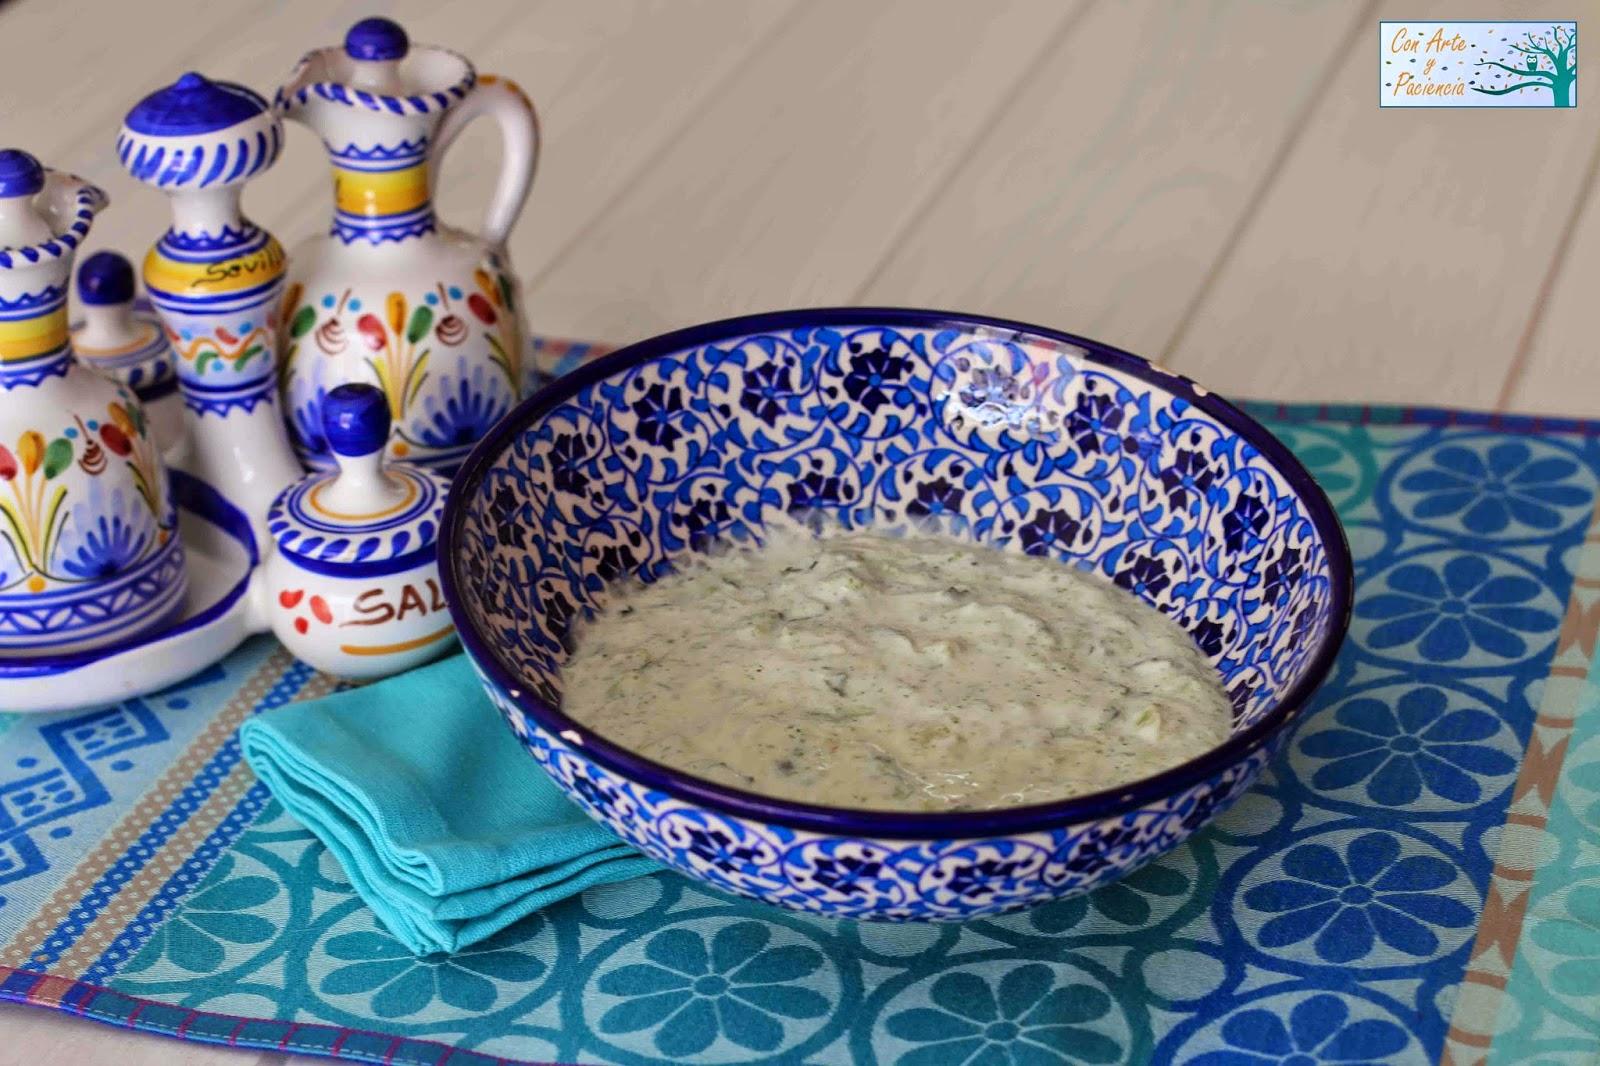 salsa,griega,tzatzíki,ajo,pepino,sal,pimienta,fría,típica,mediterránea,sana,greek,sauce,yogur,